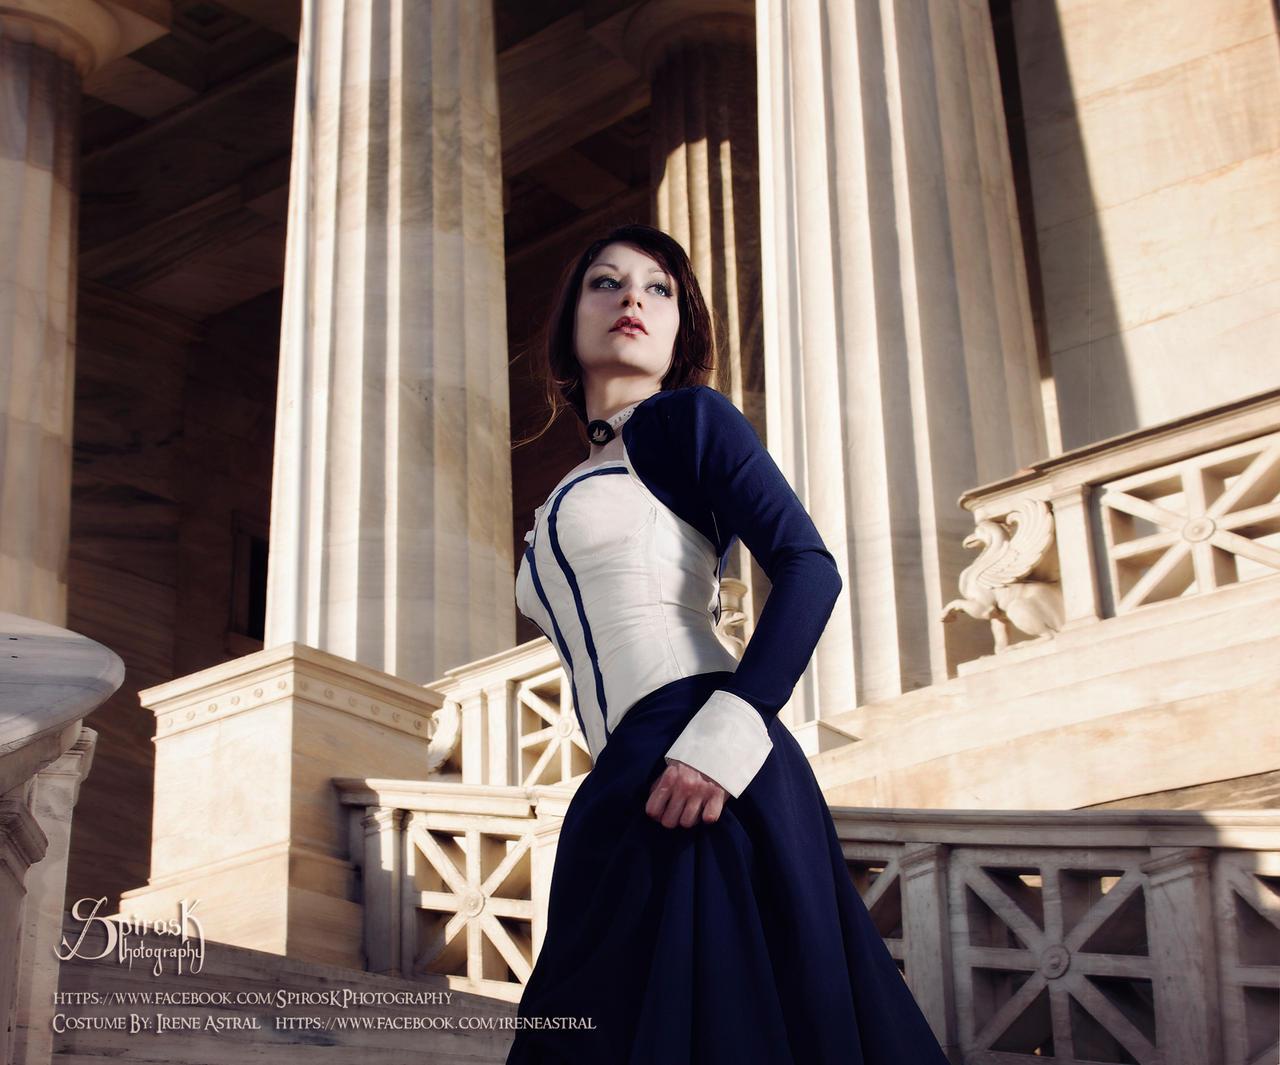 Bioshock Infinite Cosplay (Elizabeth): Ascending by IreneAstral